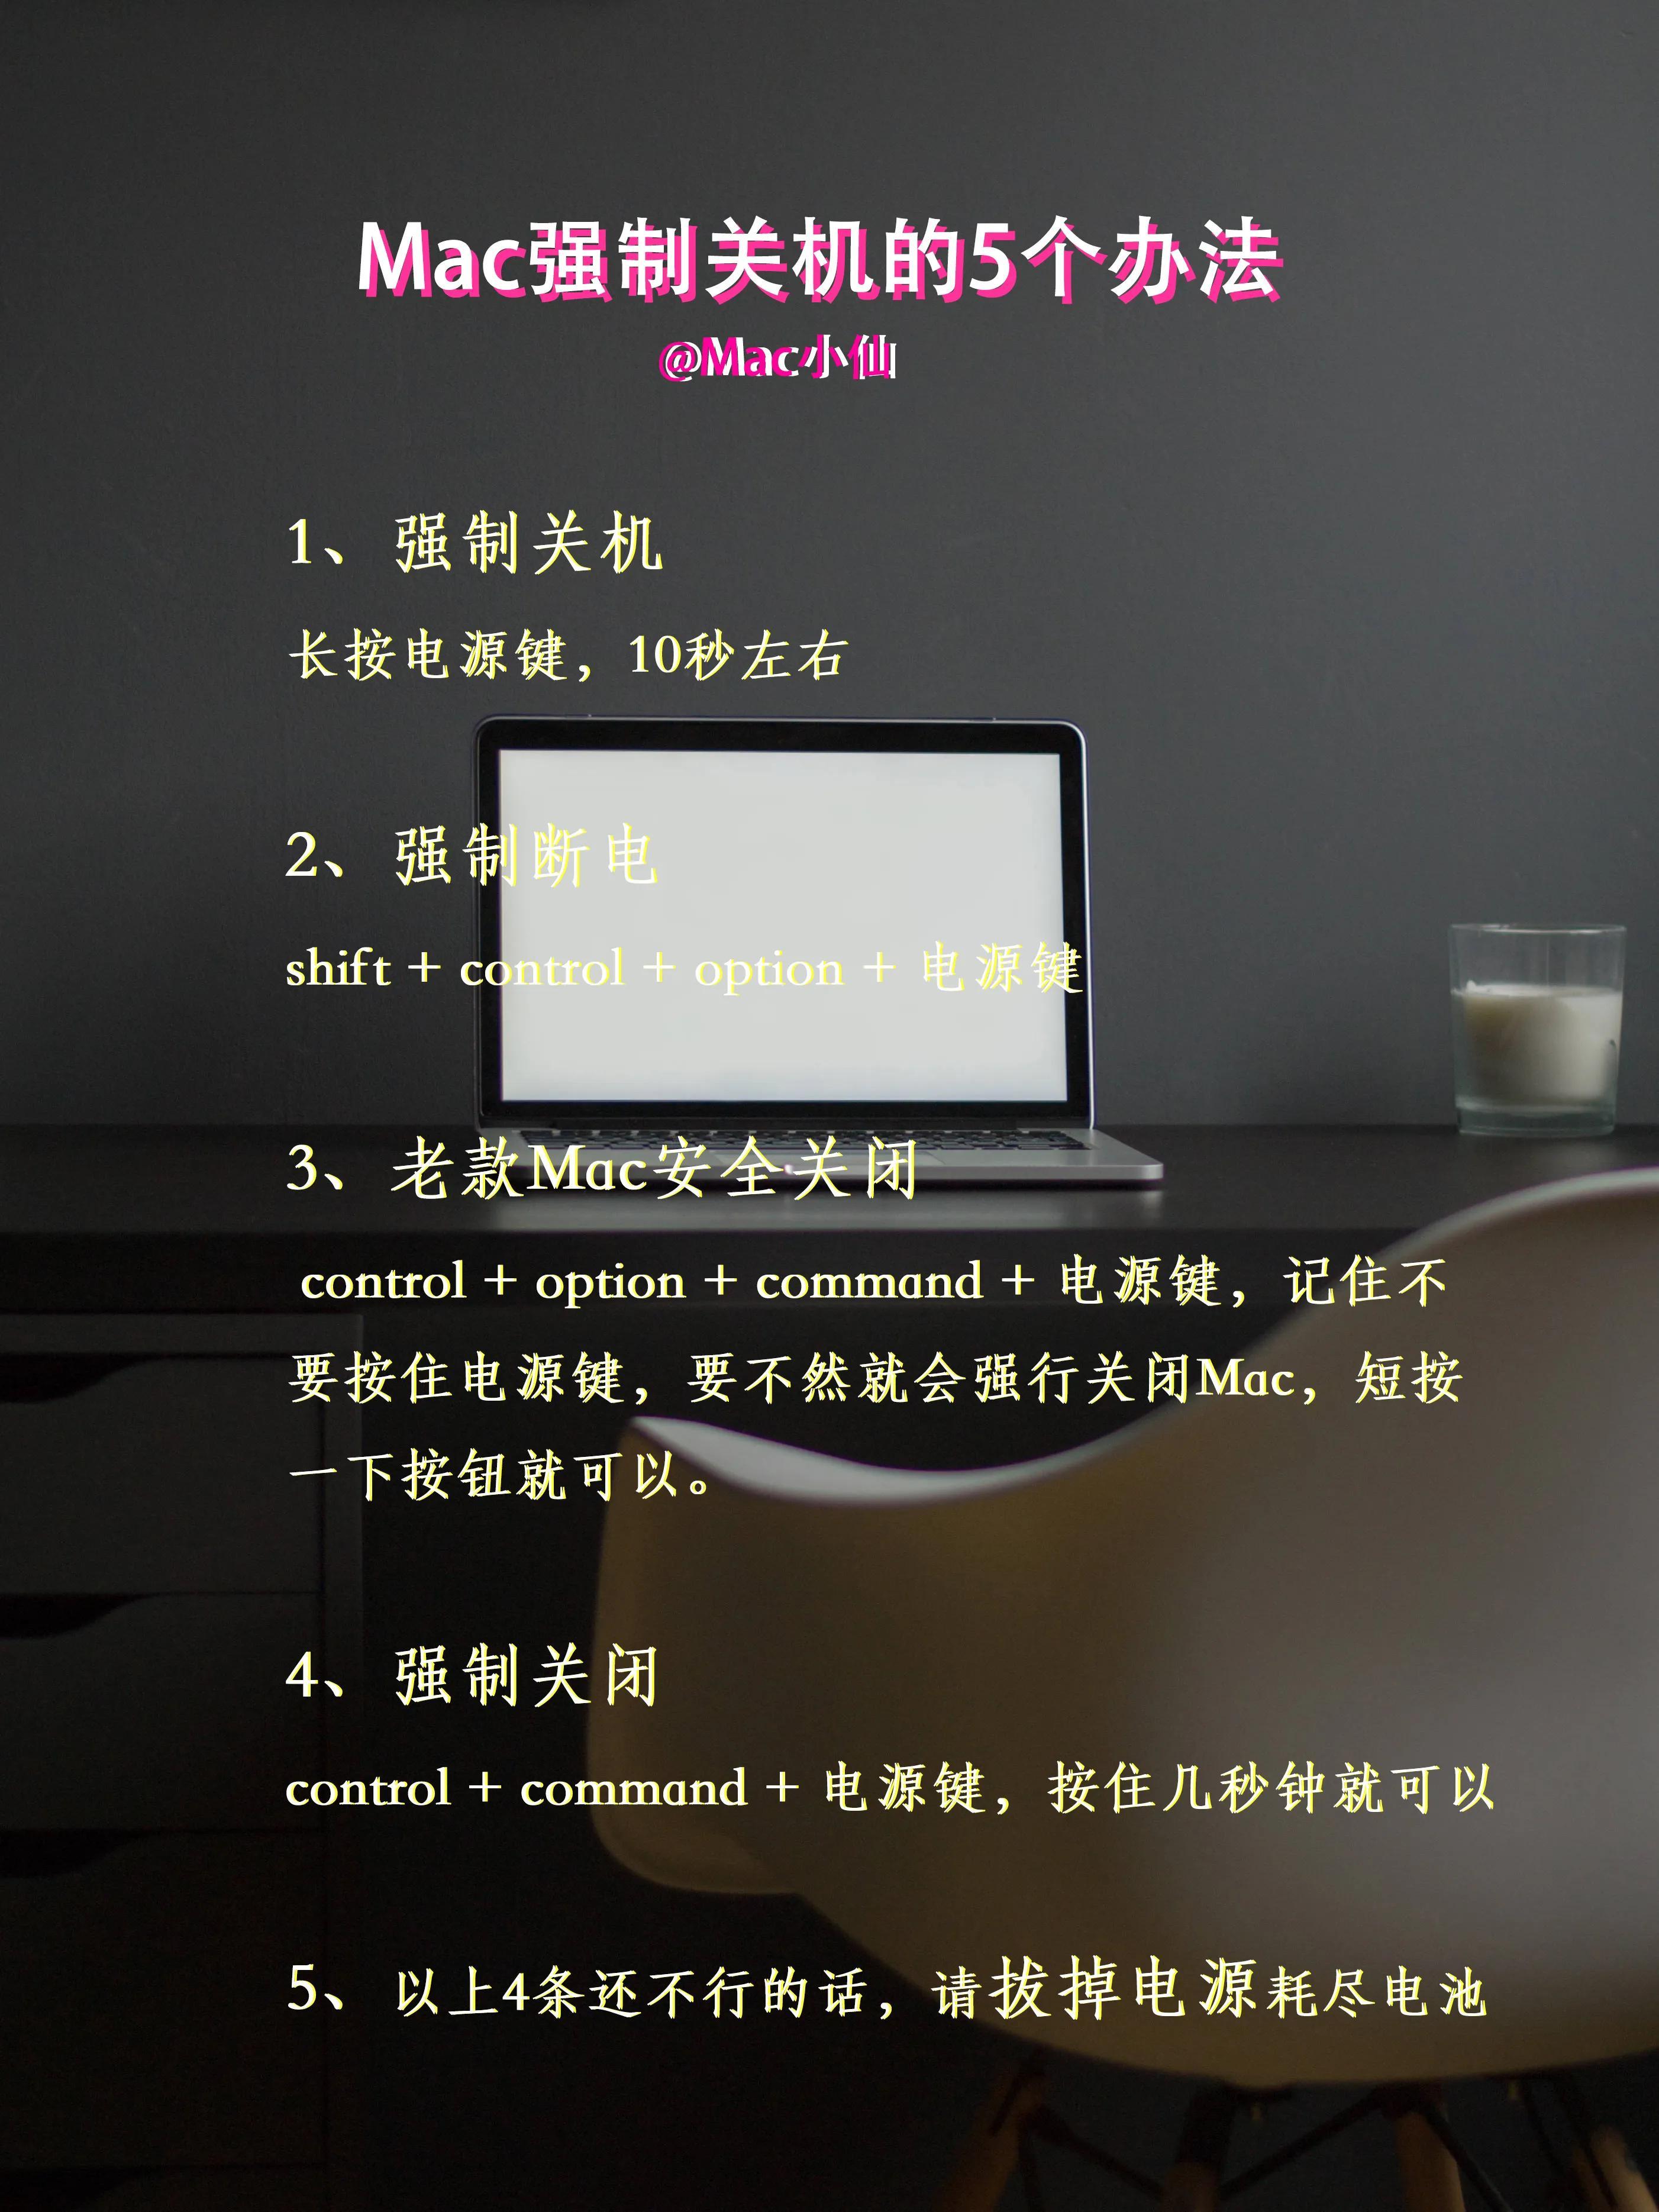 macbook卡住了怎么办不能关机怎么办(5种强制关机的方法)